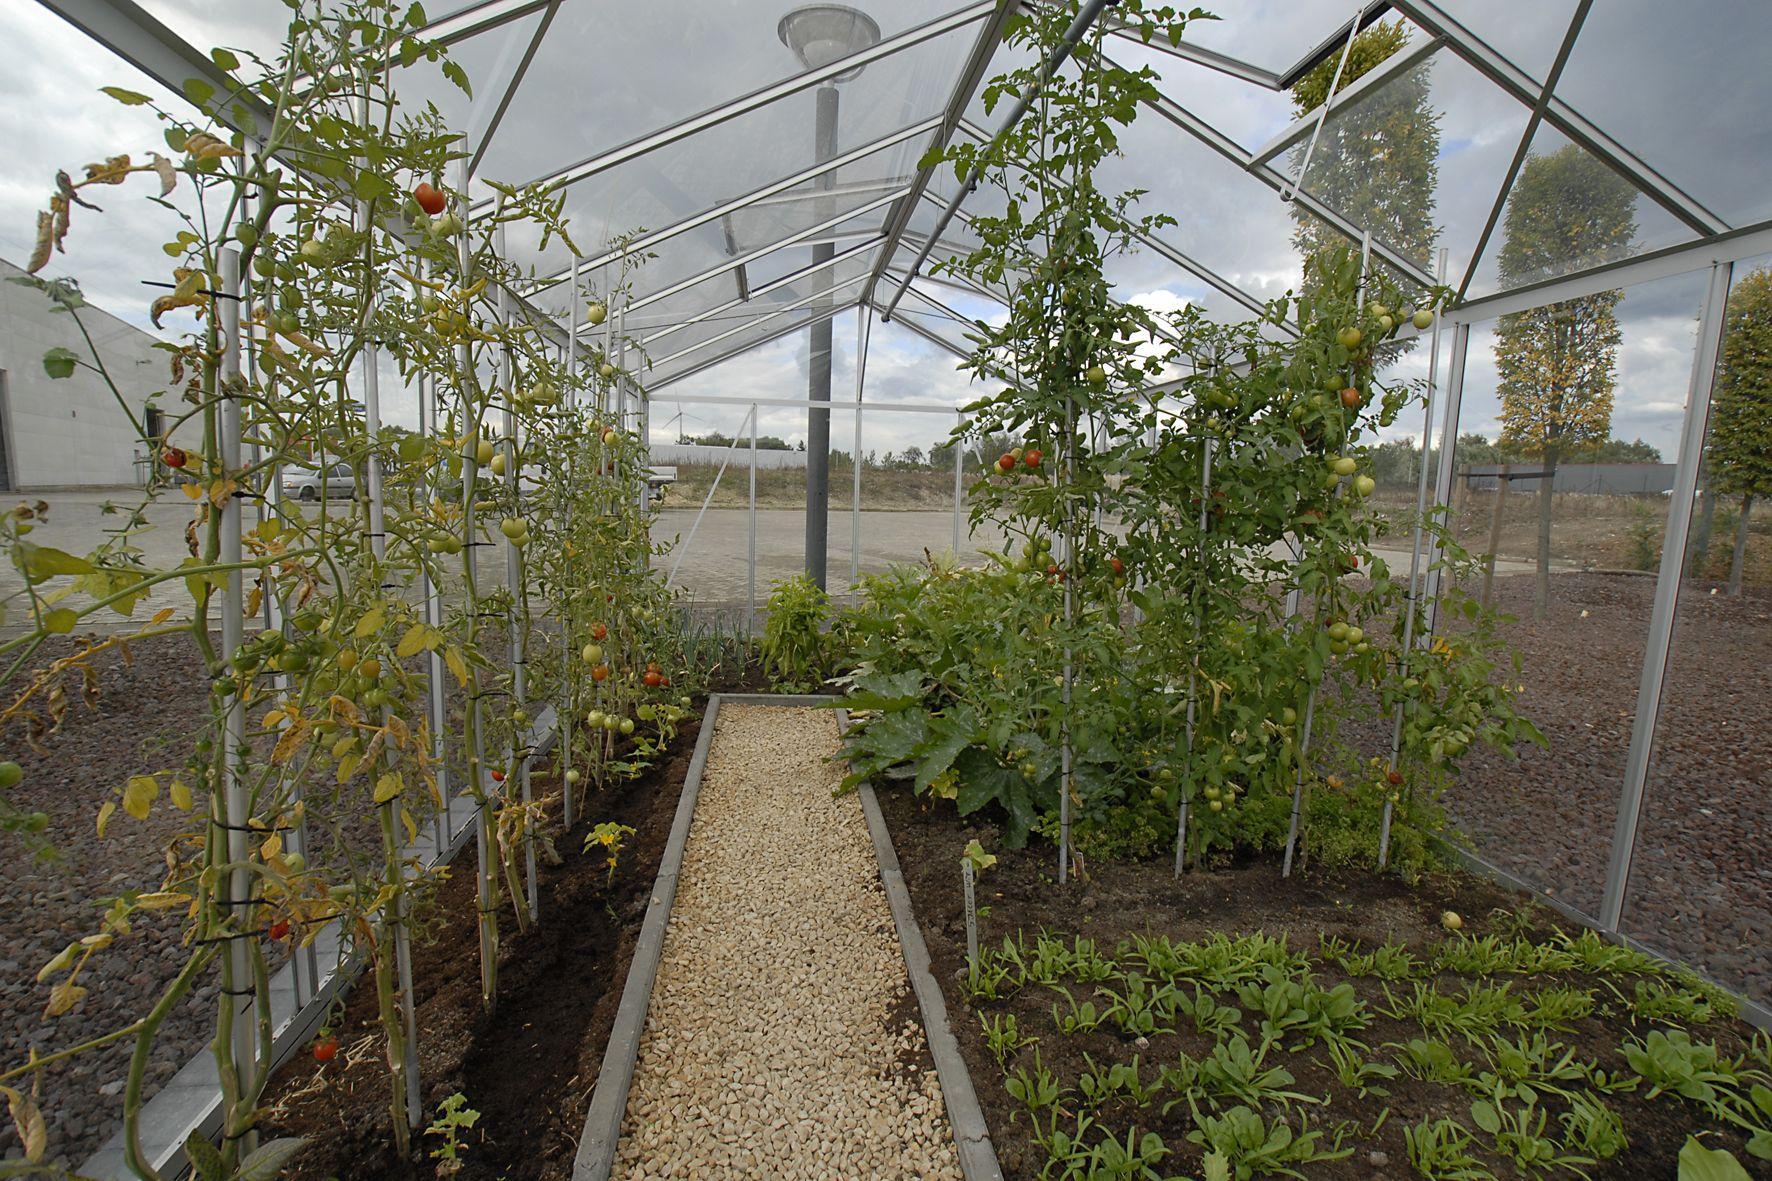 serre garden serre maxi 3 09 x 5 30 m aluminium brut decor jardin pinterest potager. Black Bedroom Furniture Sets. Home Design Ideas